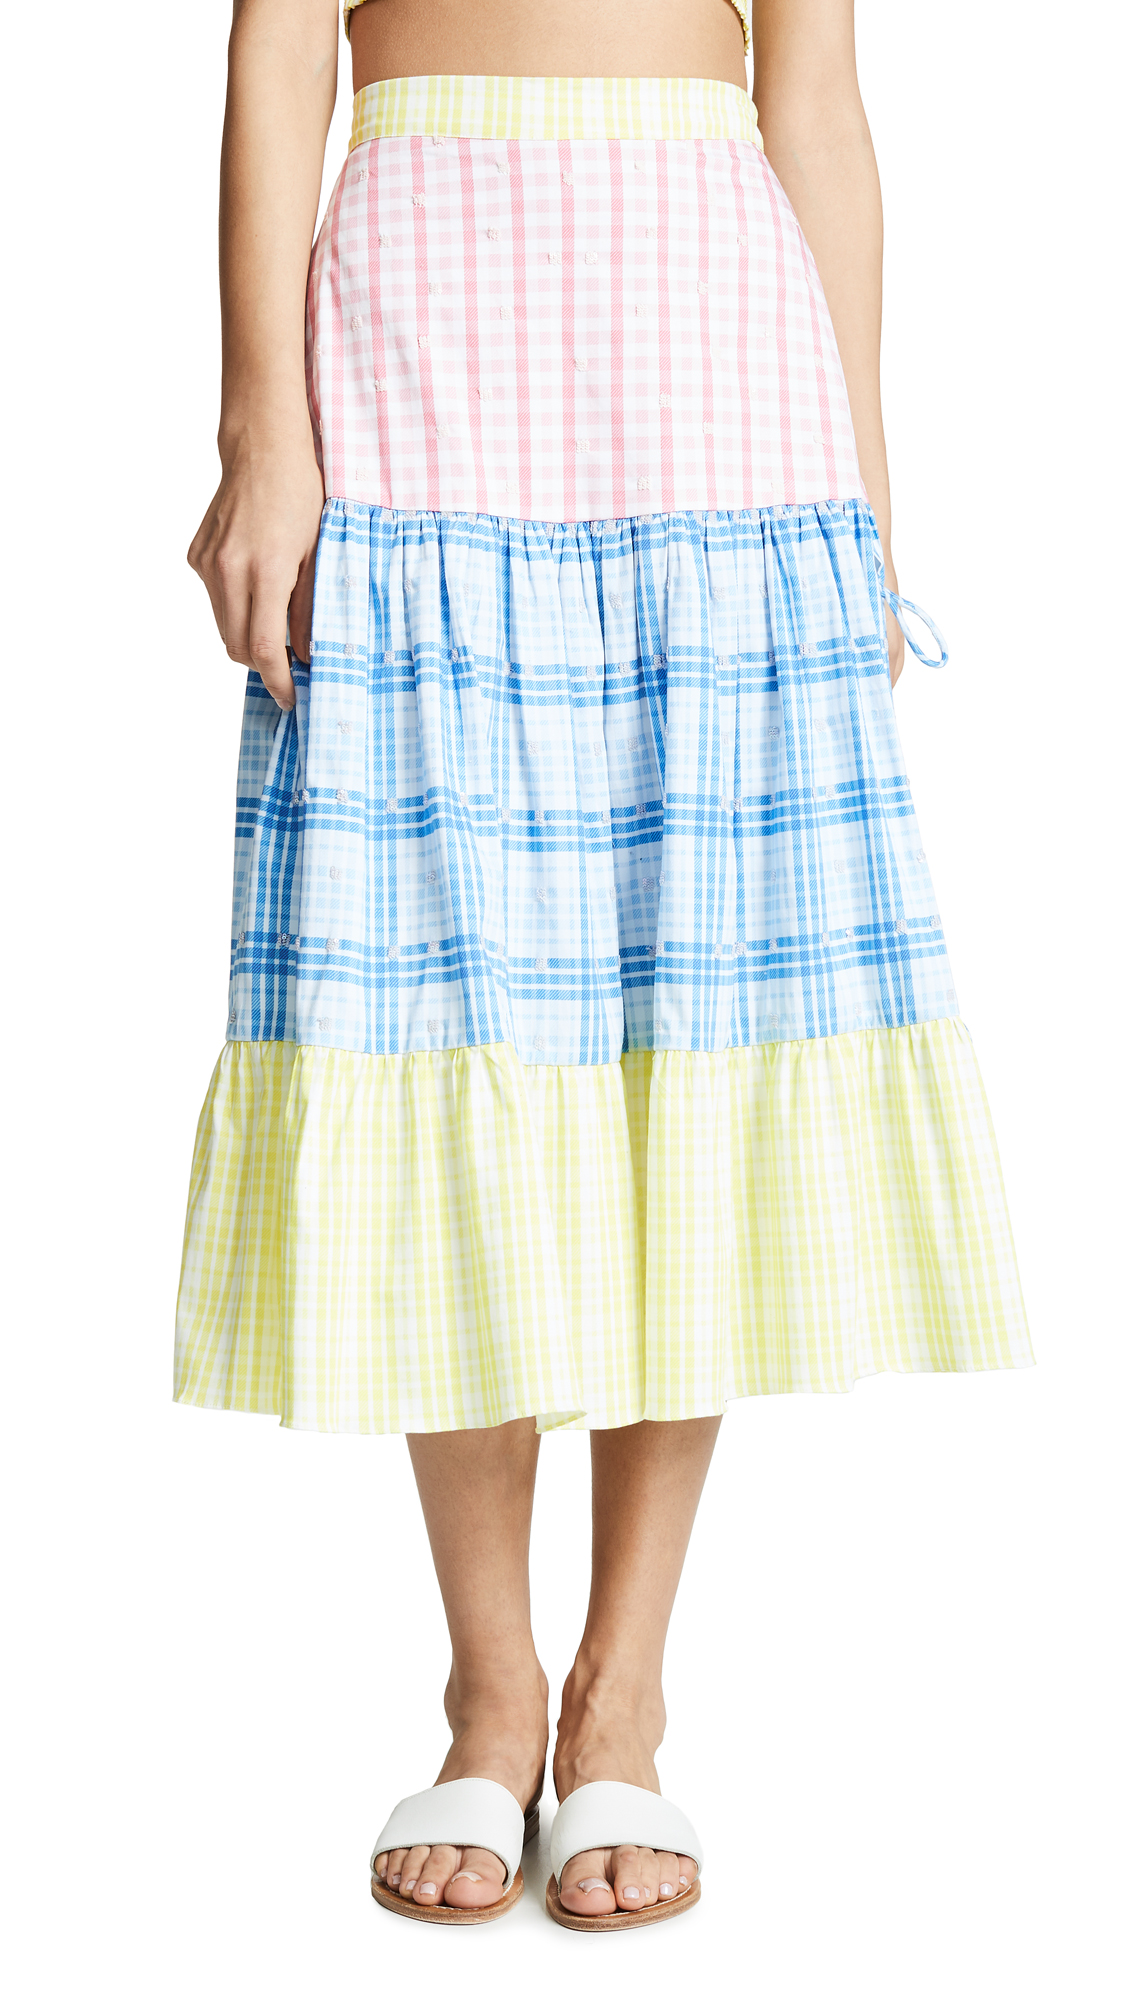 ROCOCO SAND Camelia Skirt in Multi